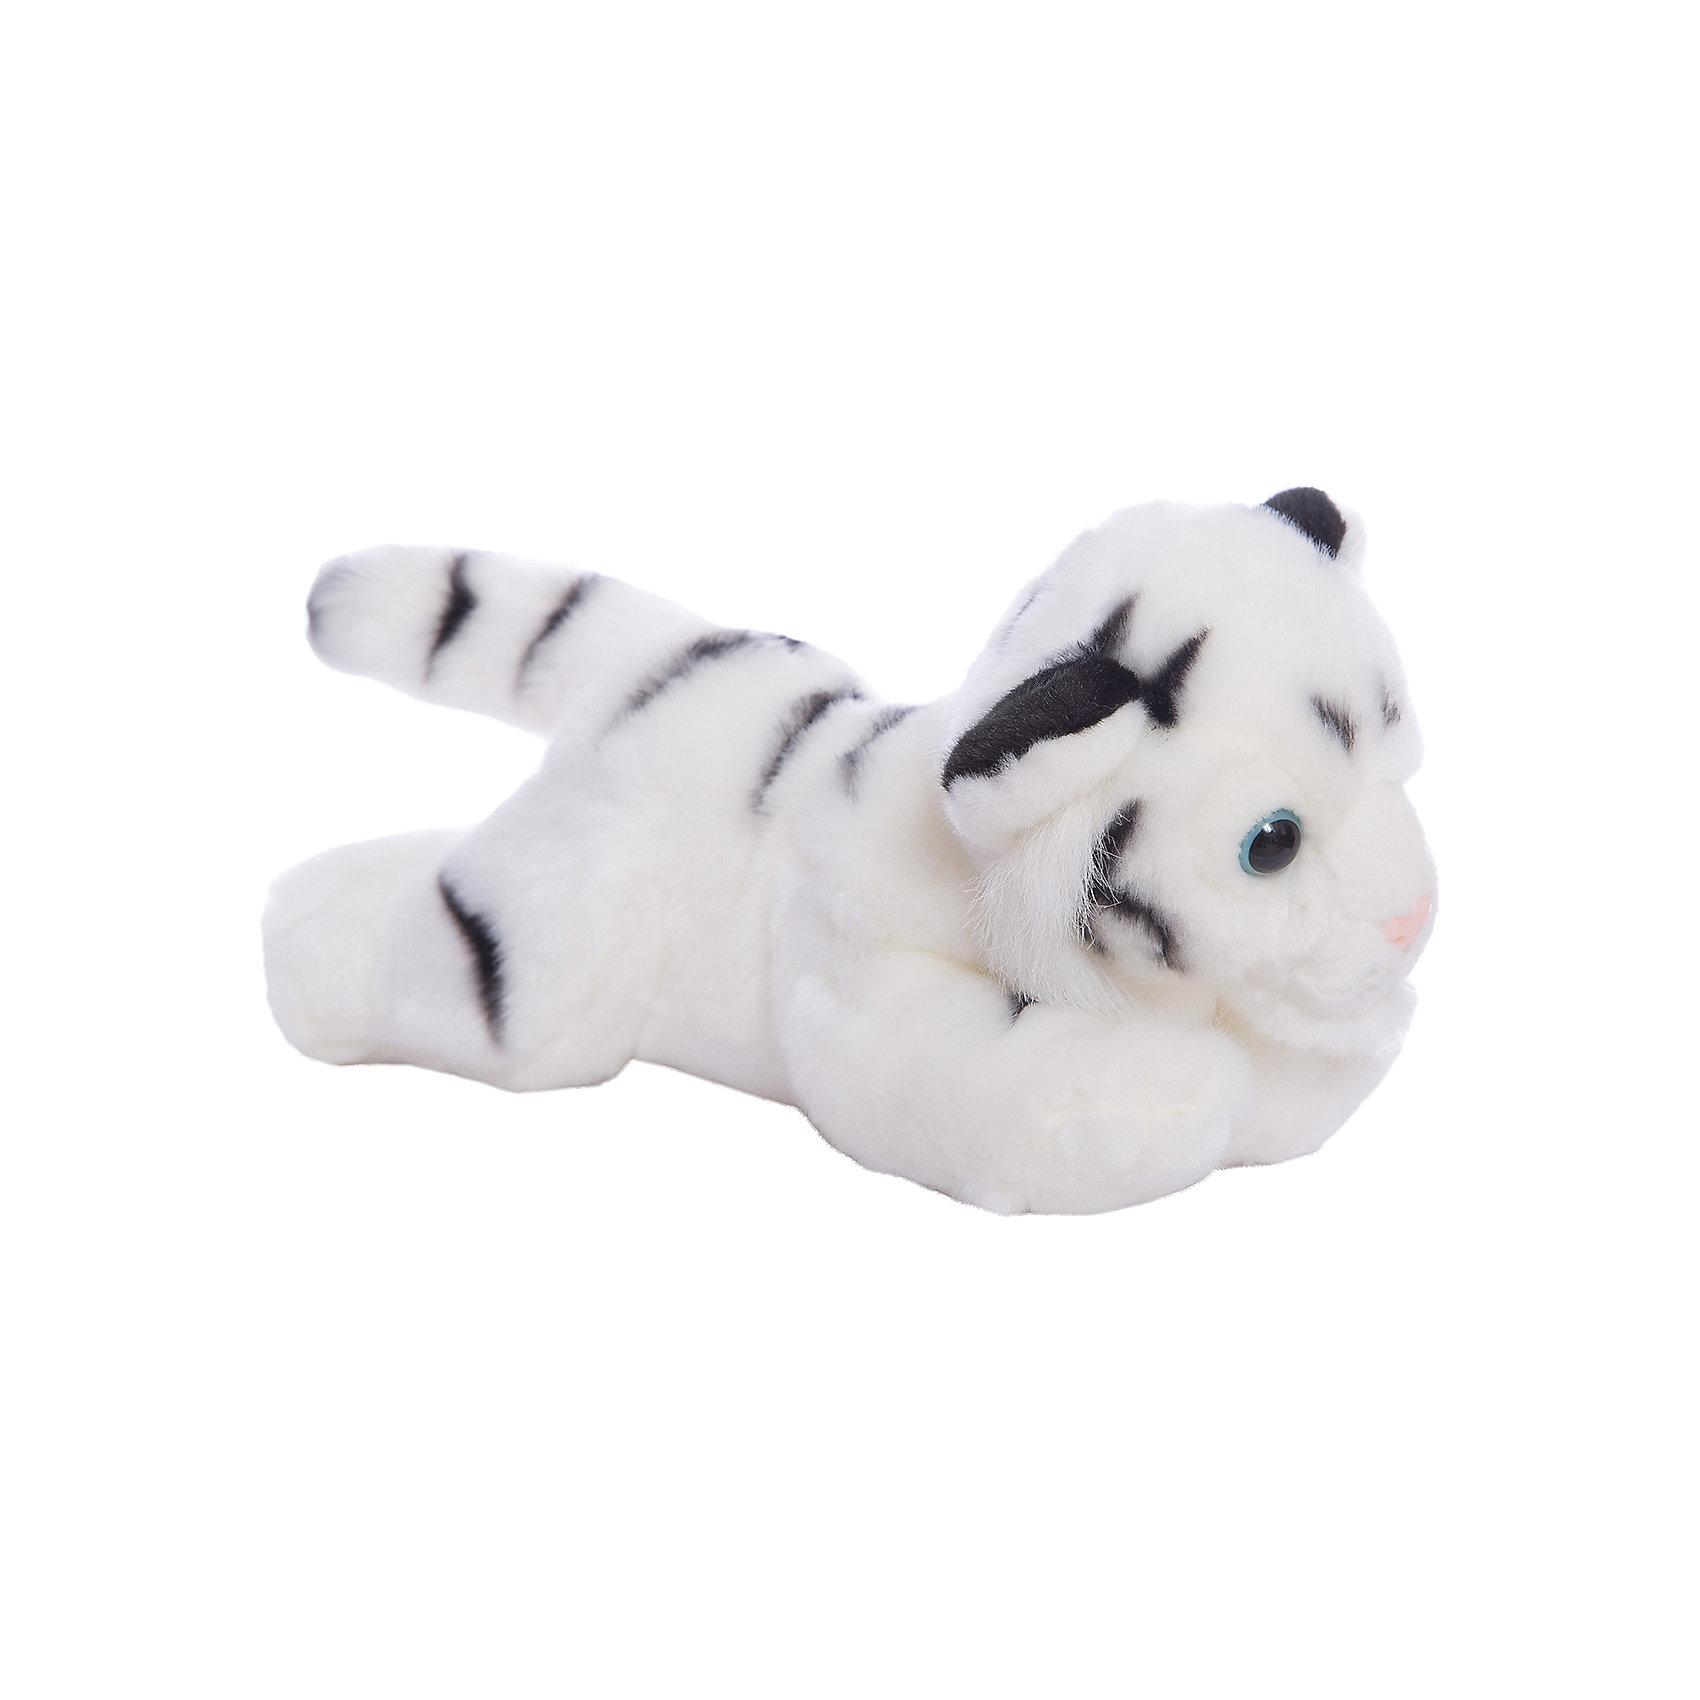 AURORA Мягкая игрушка Тигр белый, 28 см, AURORA aurora мягкая игрушка тигр 28 см